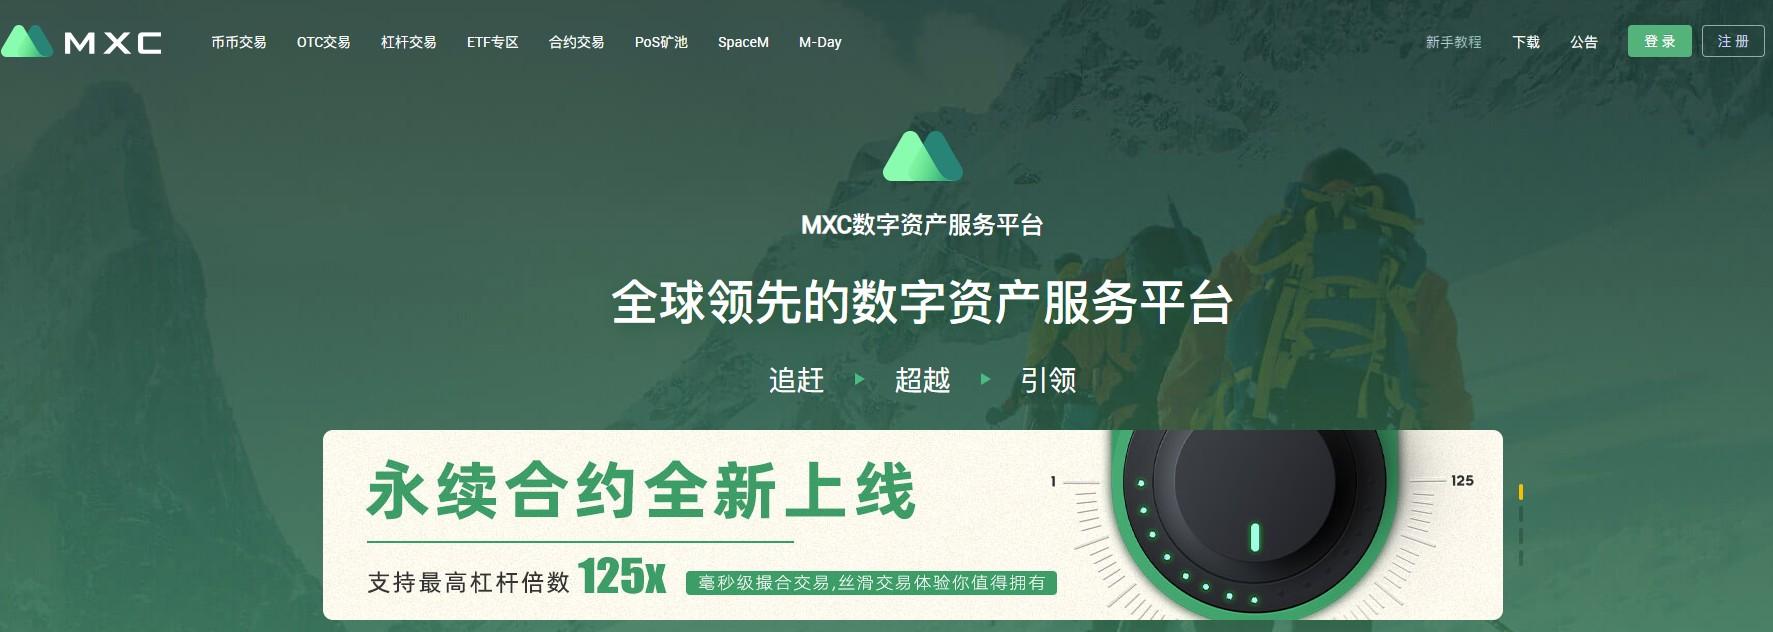 "MXC抹茶新版合约上线 ,""稳""字当头,功能大幅优化"